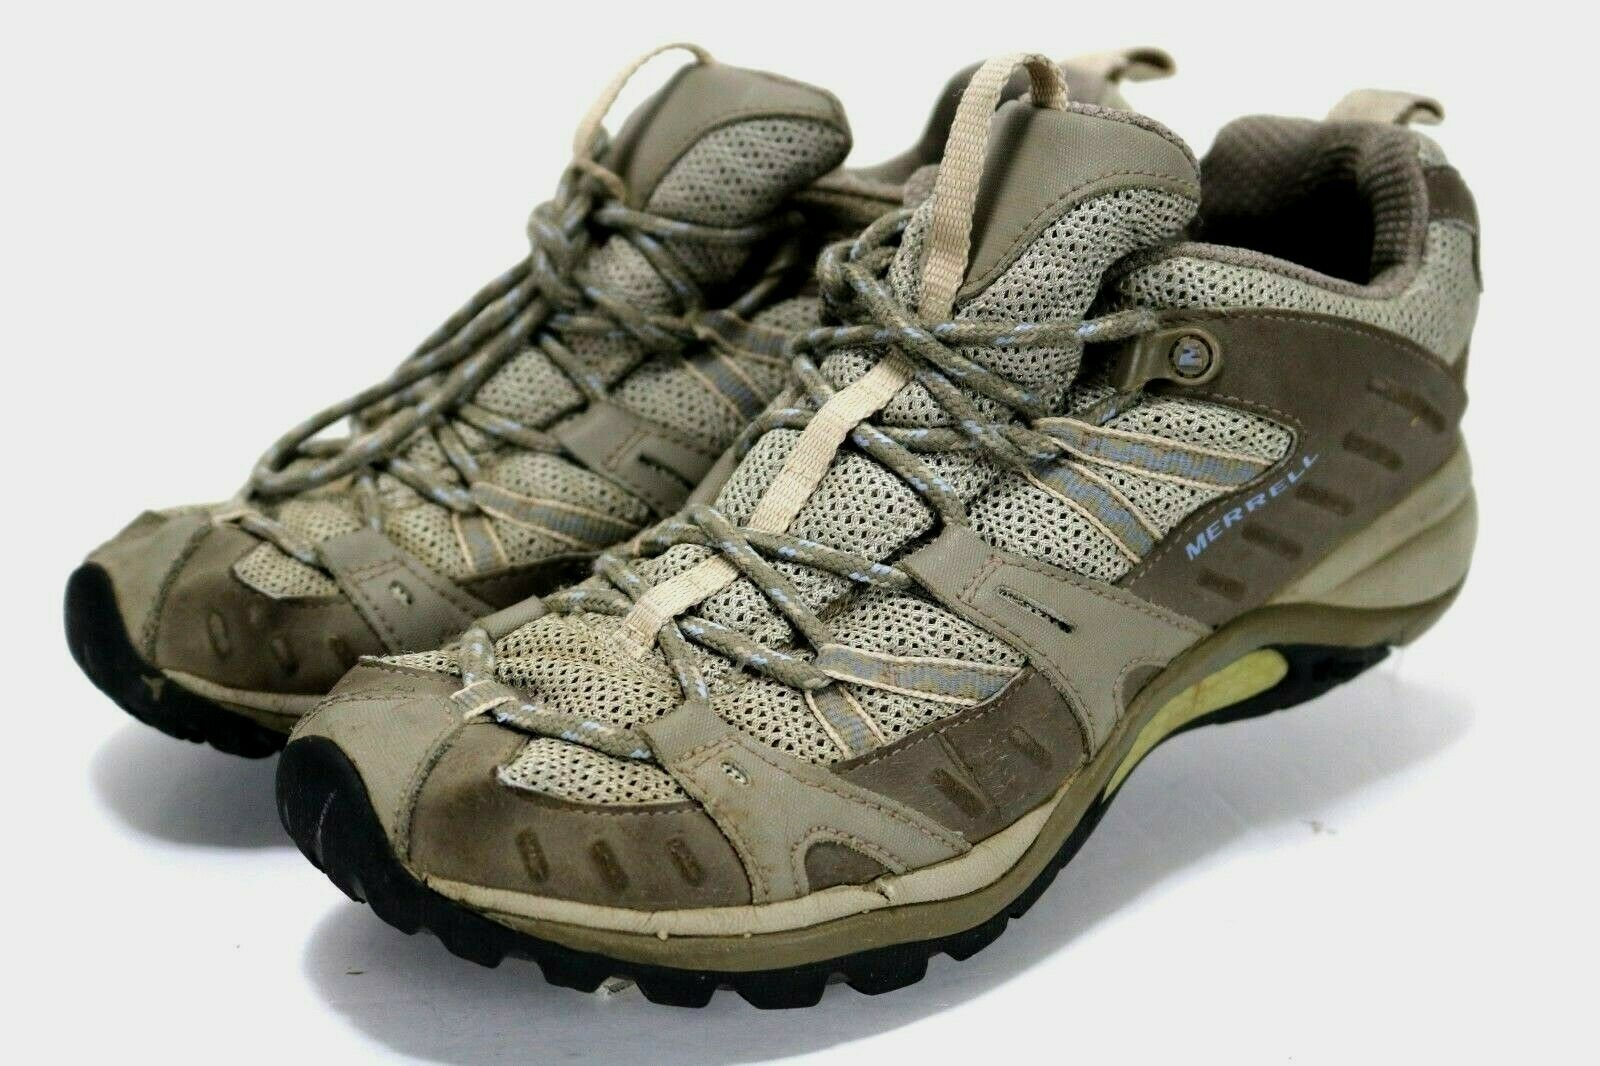 Merrell Siren Sport 2  Women's Olive Trail shoes shoes Size 8 Tan